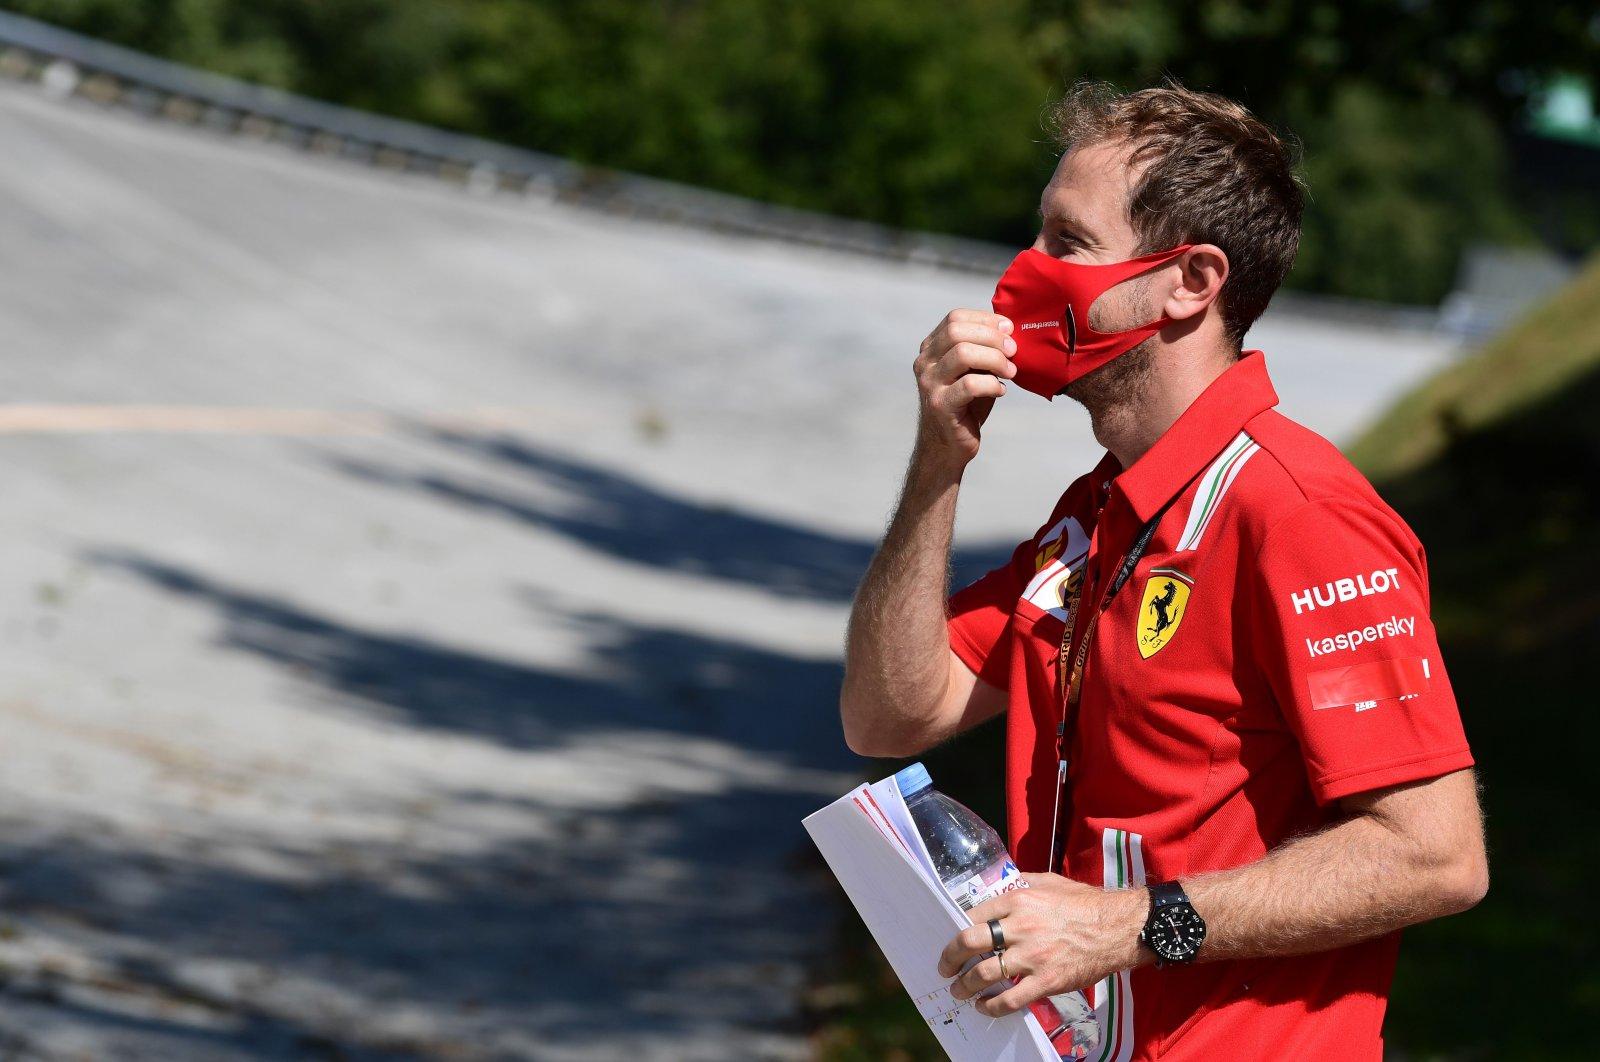 Ferrari's Sebastian Vettel visits the track ahead of the Italian Grand Prix, in Monza, Italy, Sept. 3, 2020. (AFP Photo)